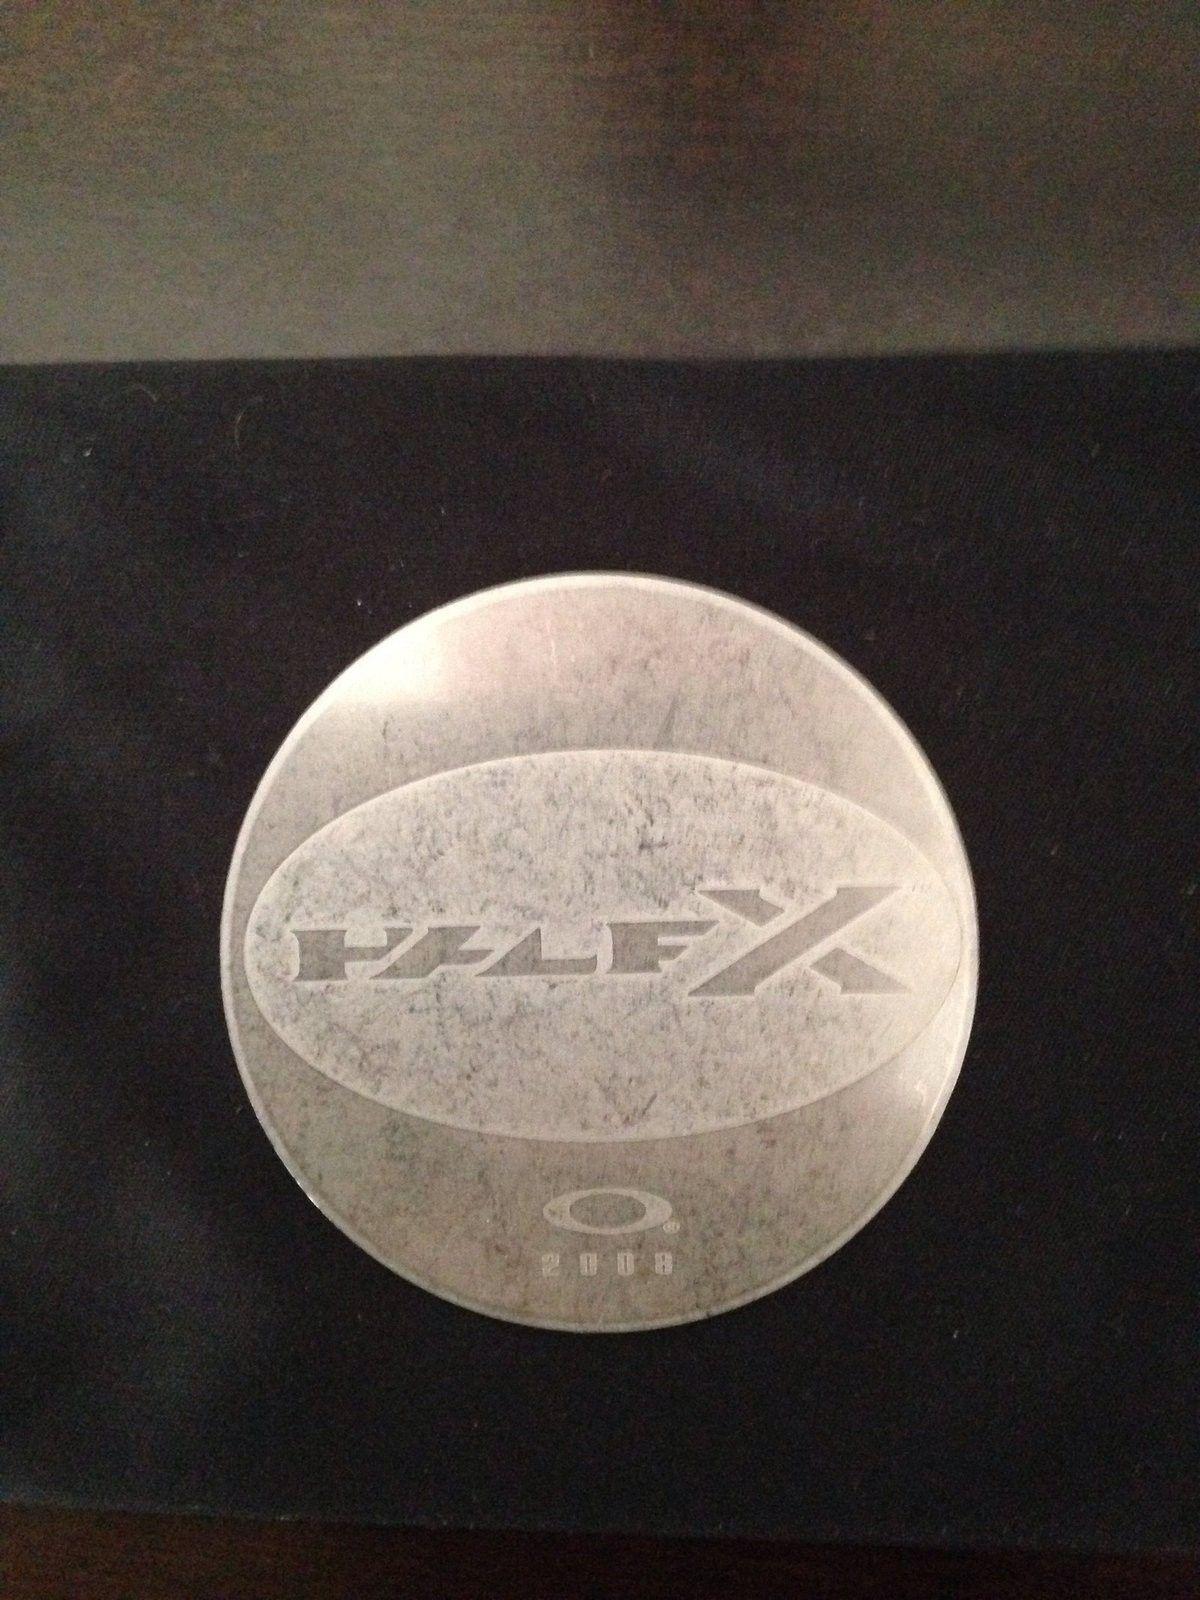 Badman and Half X Coin - image.jpg